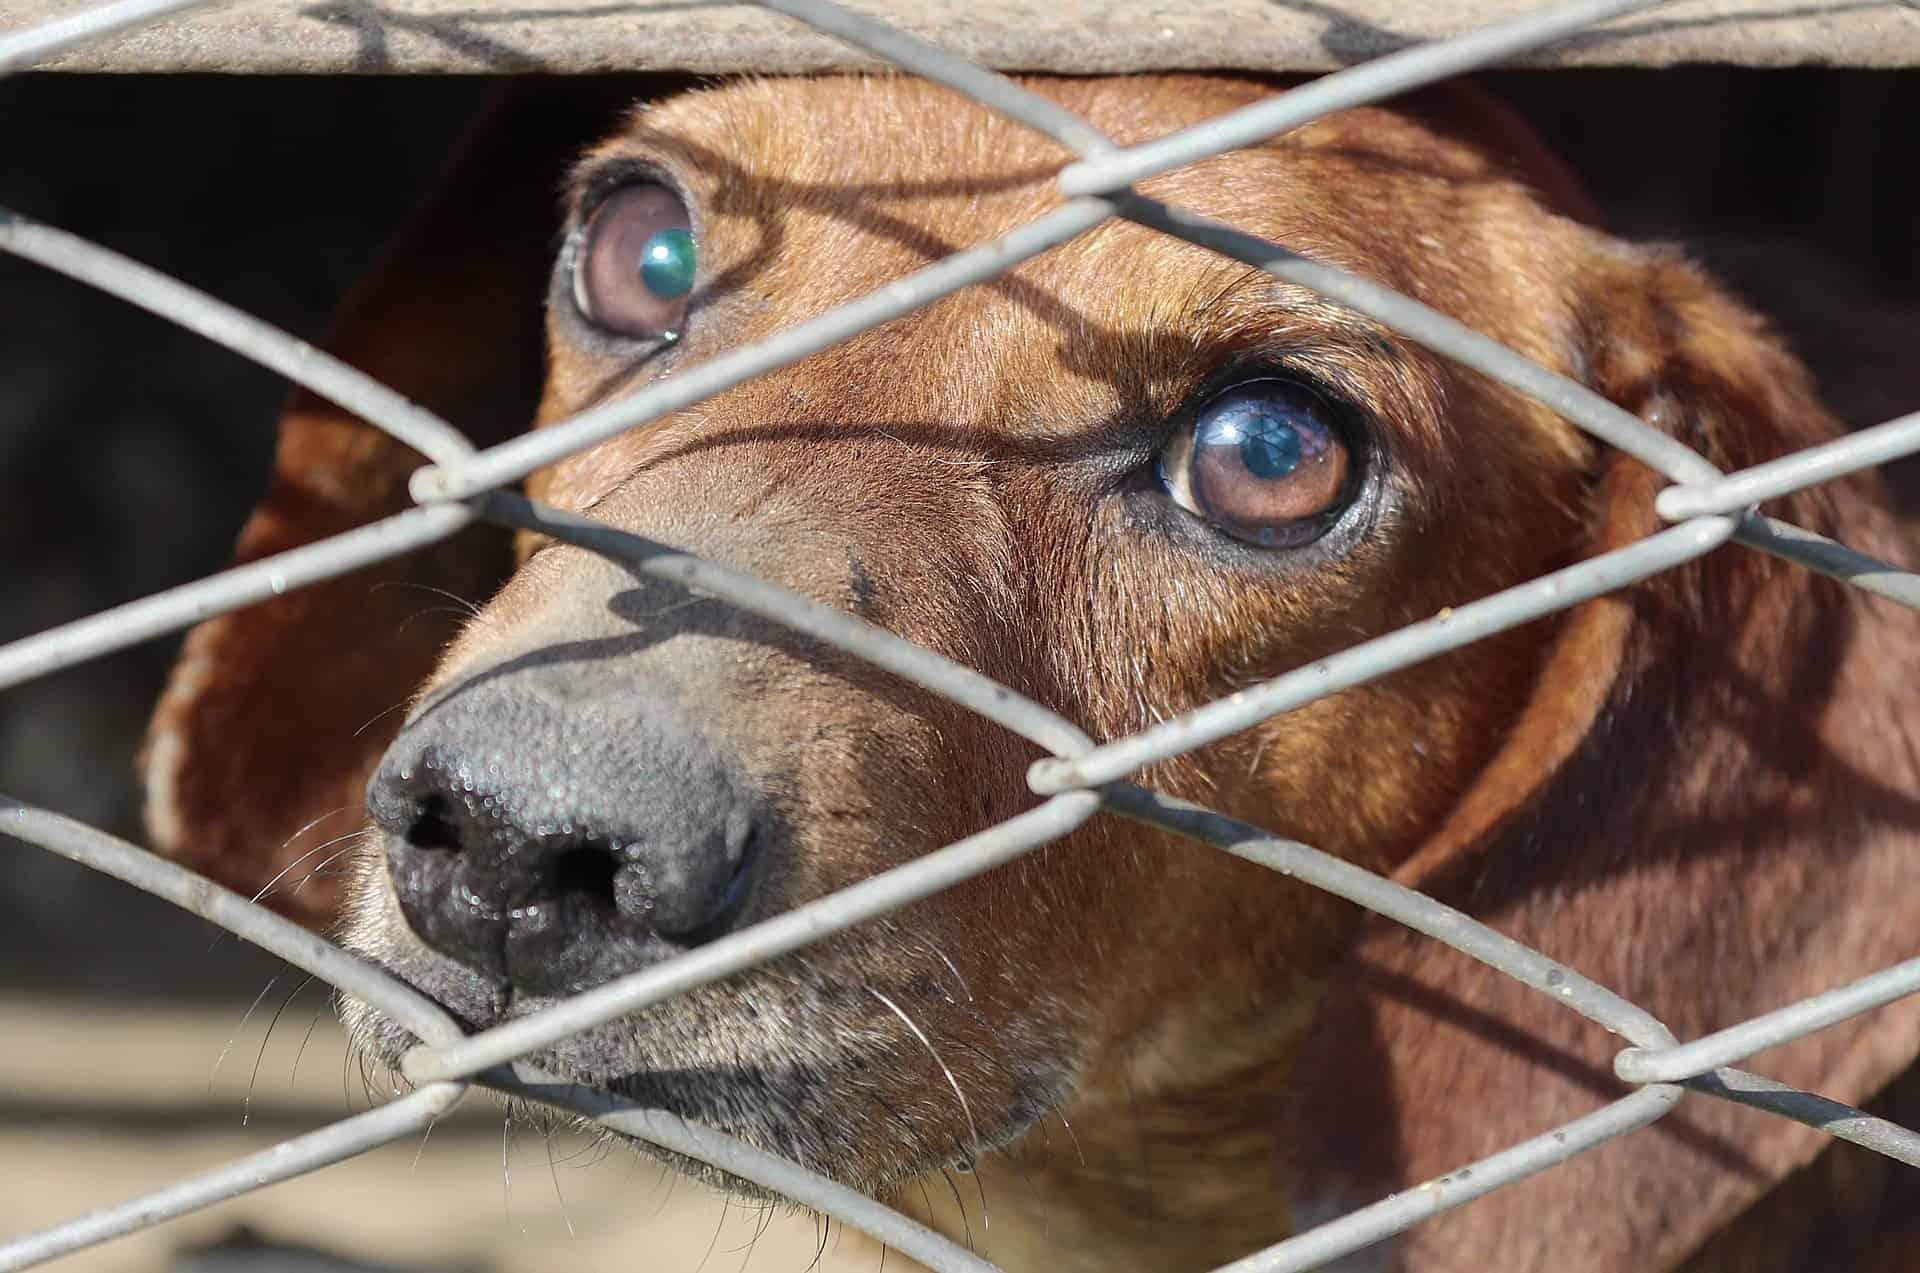 dachshund-2683905_1920